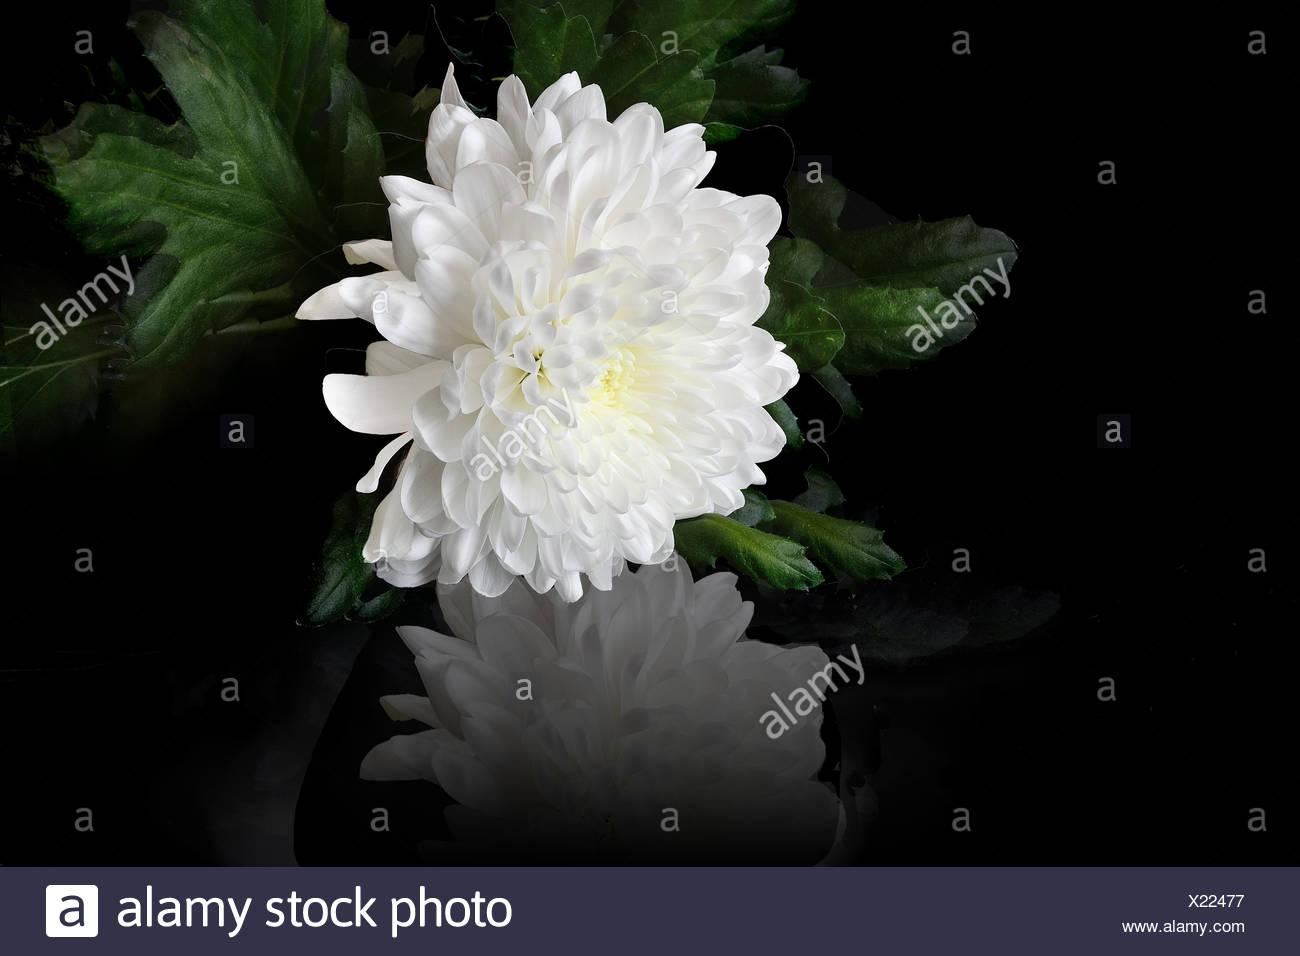 White Chrysanthemum Flower Stock Photo 276642443 Alamy